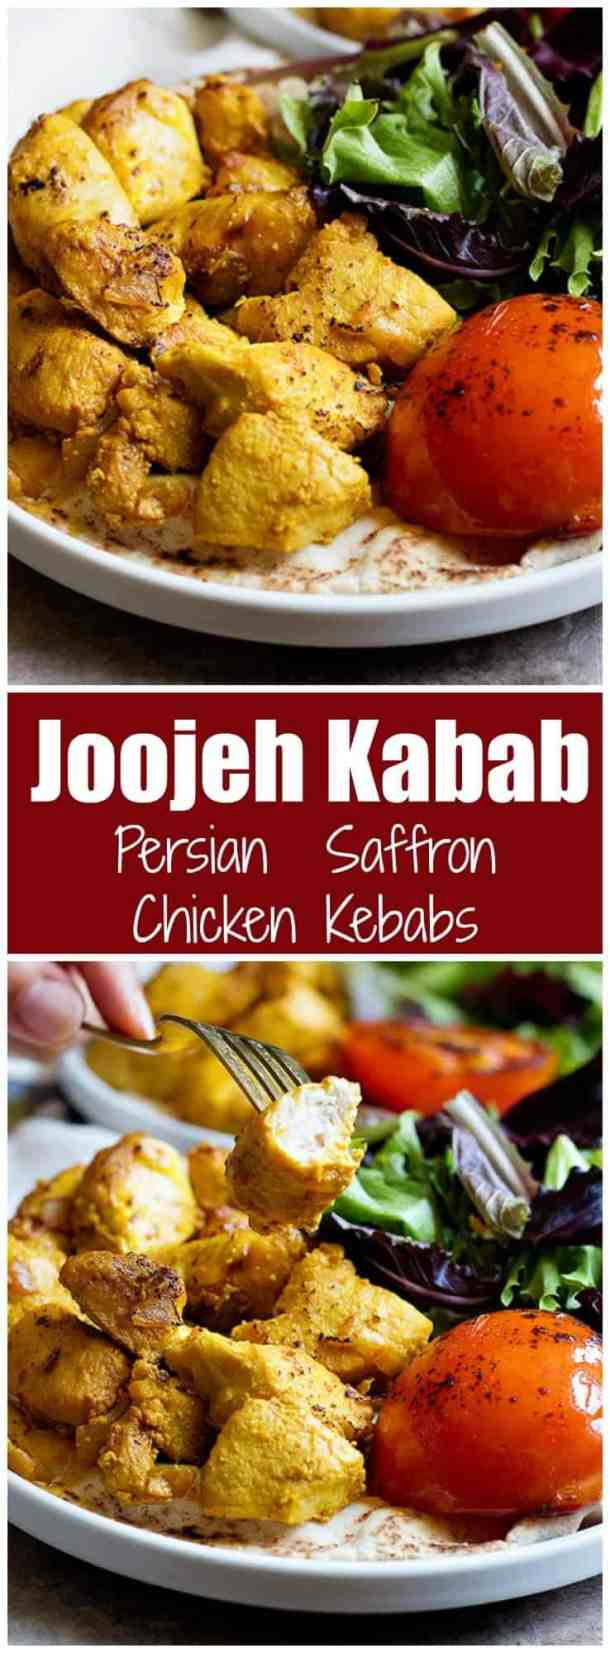 Joojeh kabab | Persian chicken kebab | Persian Kebab recipe | Persian recipe | easy Persian recipes | Persian saffron chicken | chicken kebabs | chicken kebob | summer grilling recipes | #persianrecipes #grilledchicken #easychickenrecipe